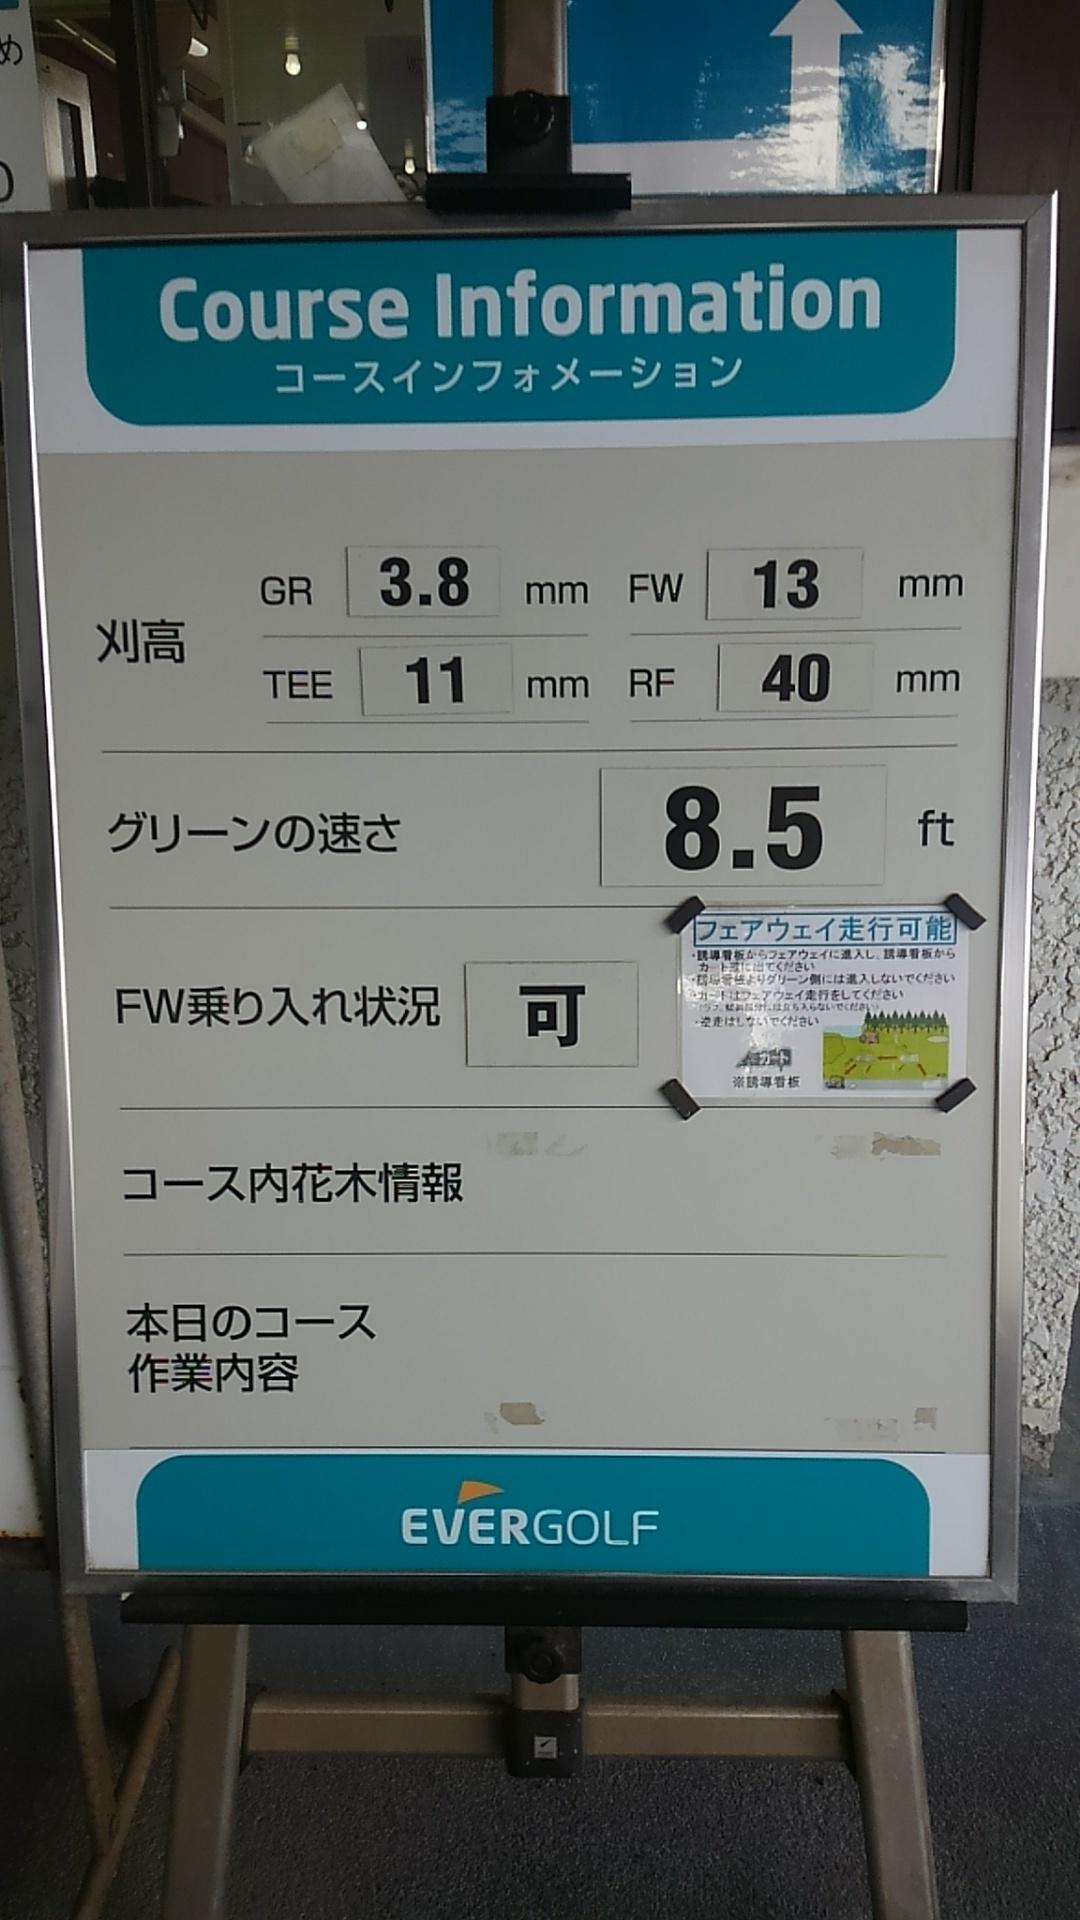 KIMG0251.jpg